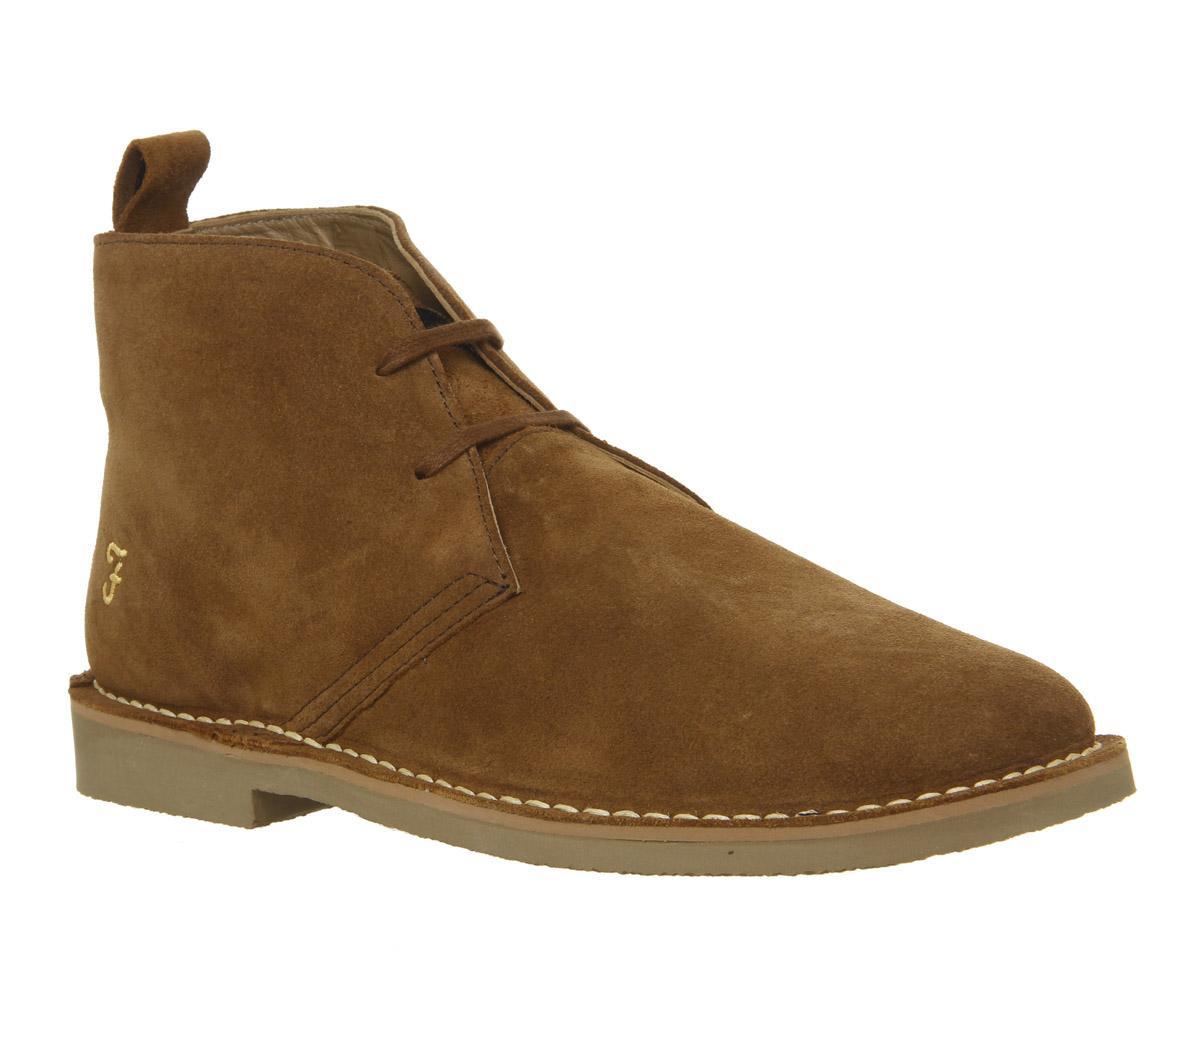 Lozza Desert Boots